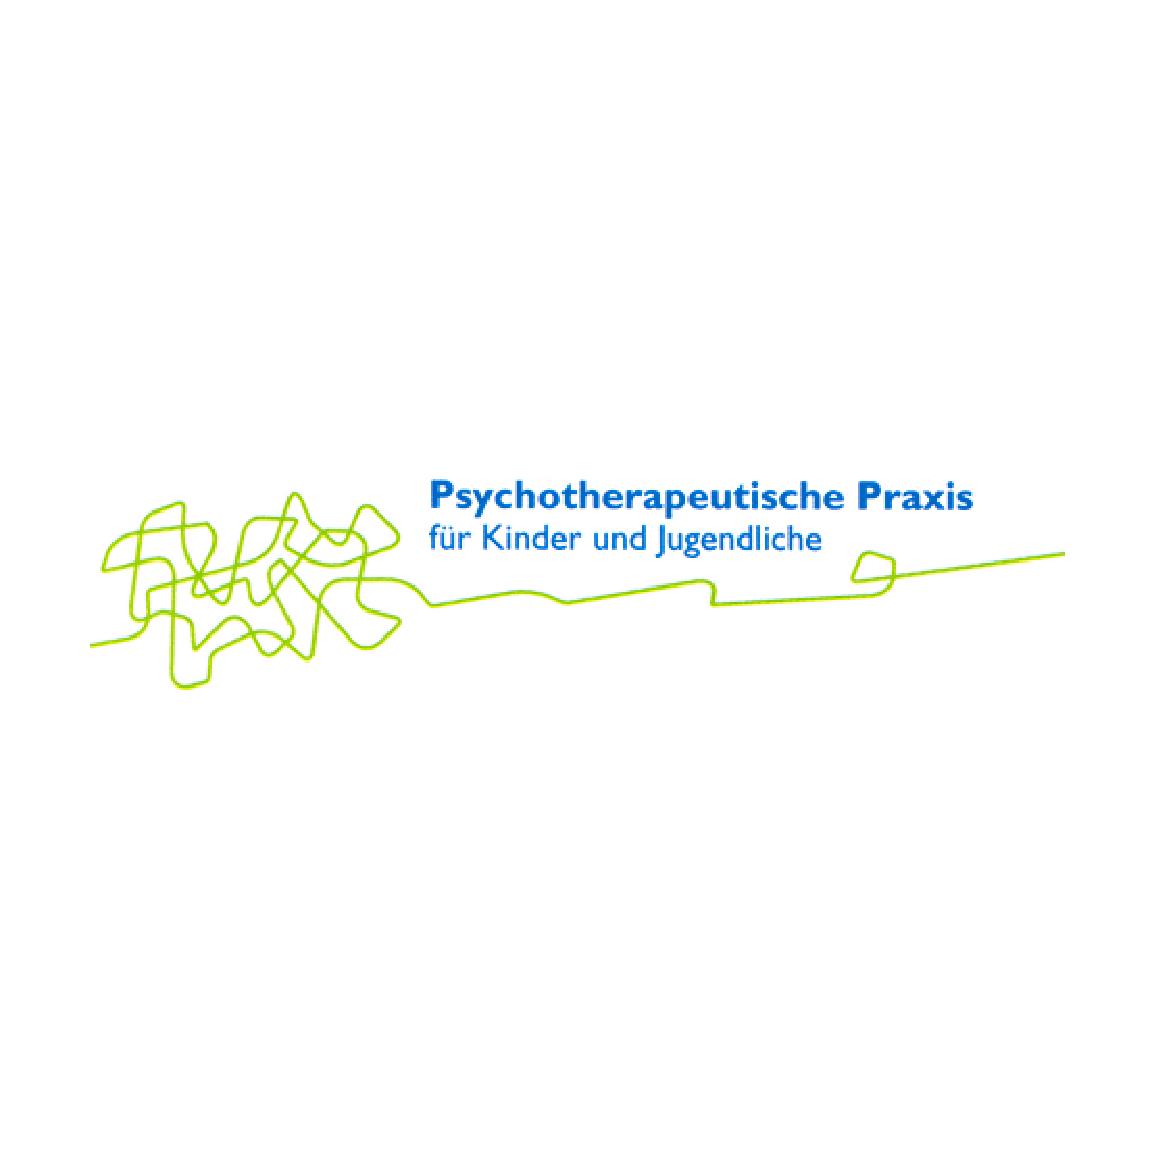 Bild zu Psychotherapeutische Praxis Ki./Ju. Torsten Gutsche in Erfurt